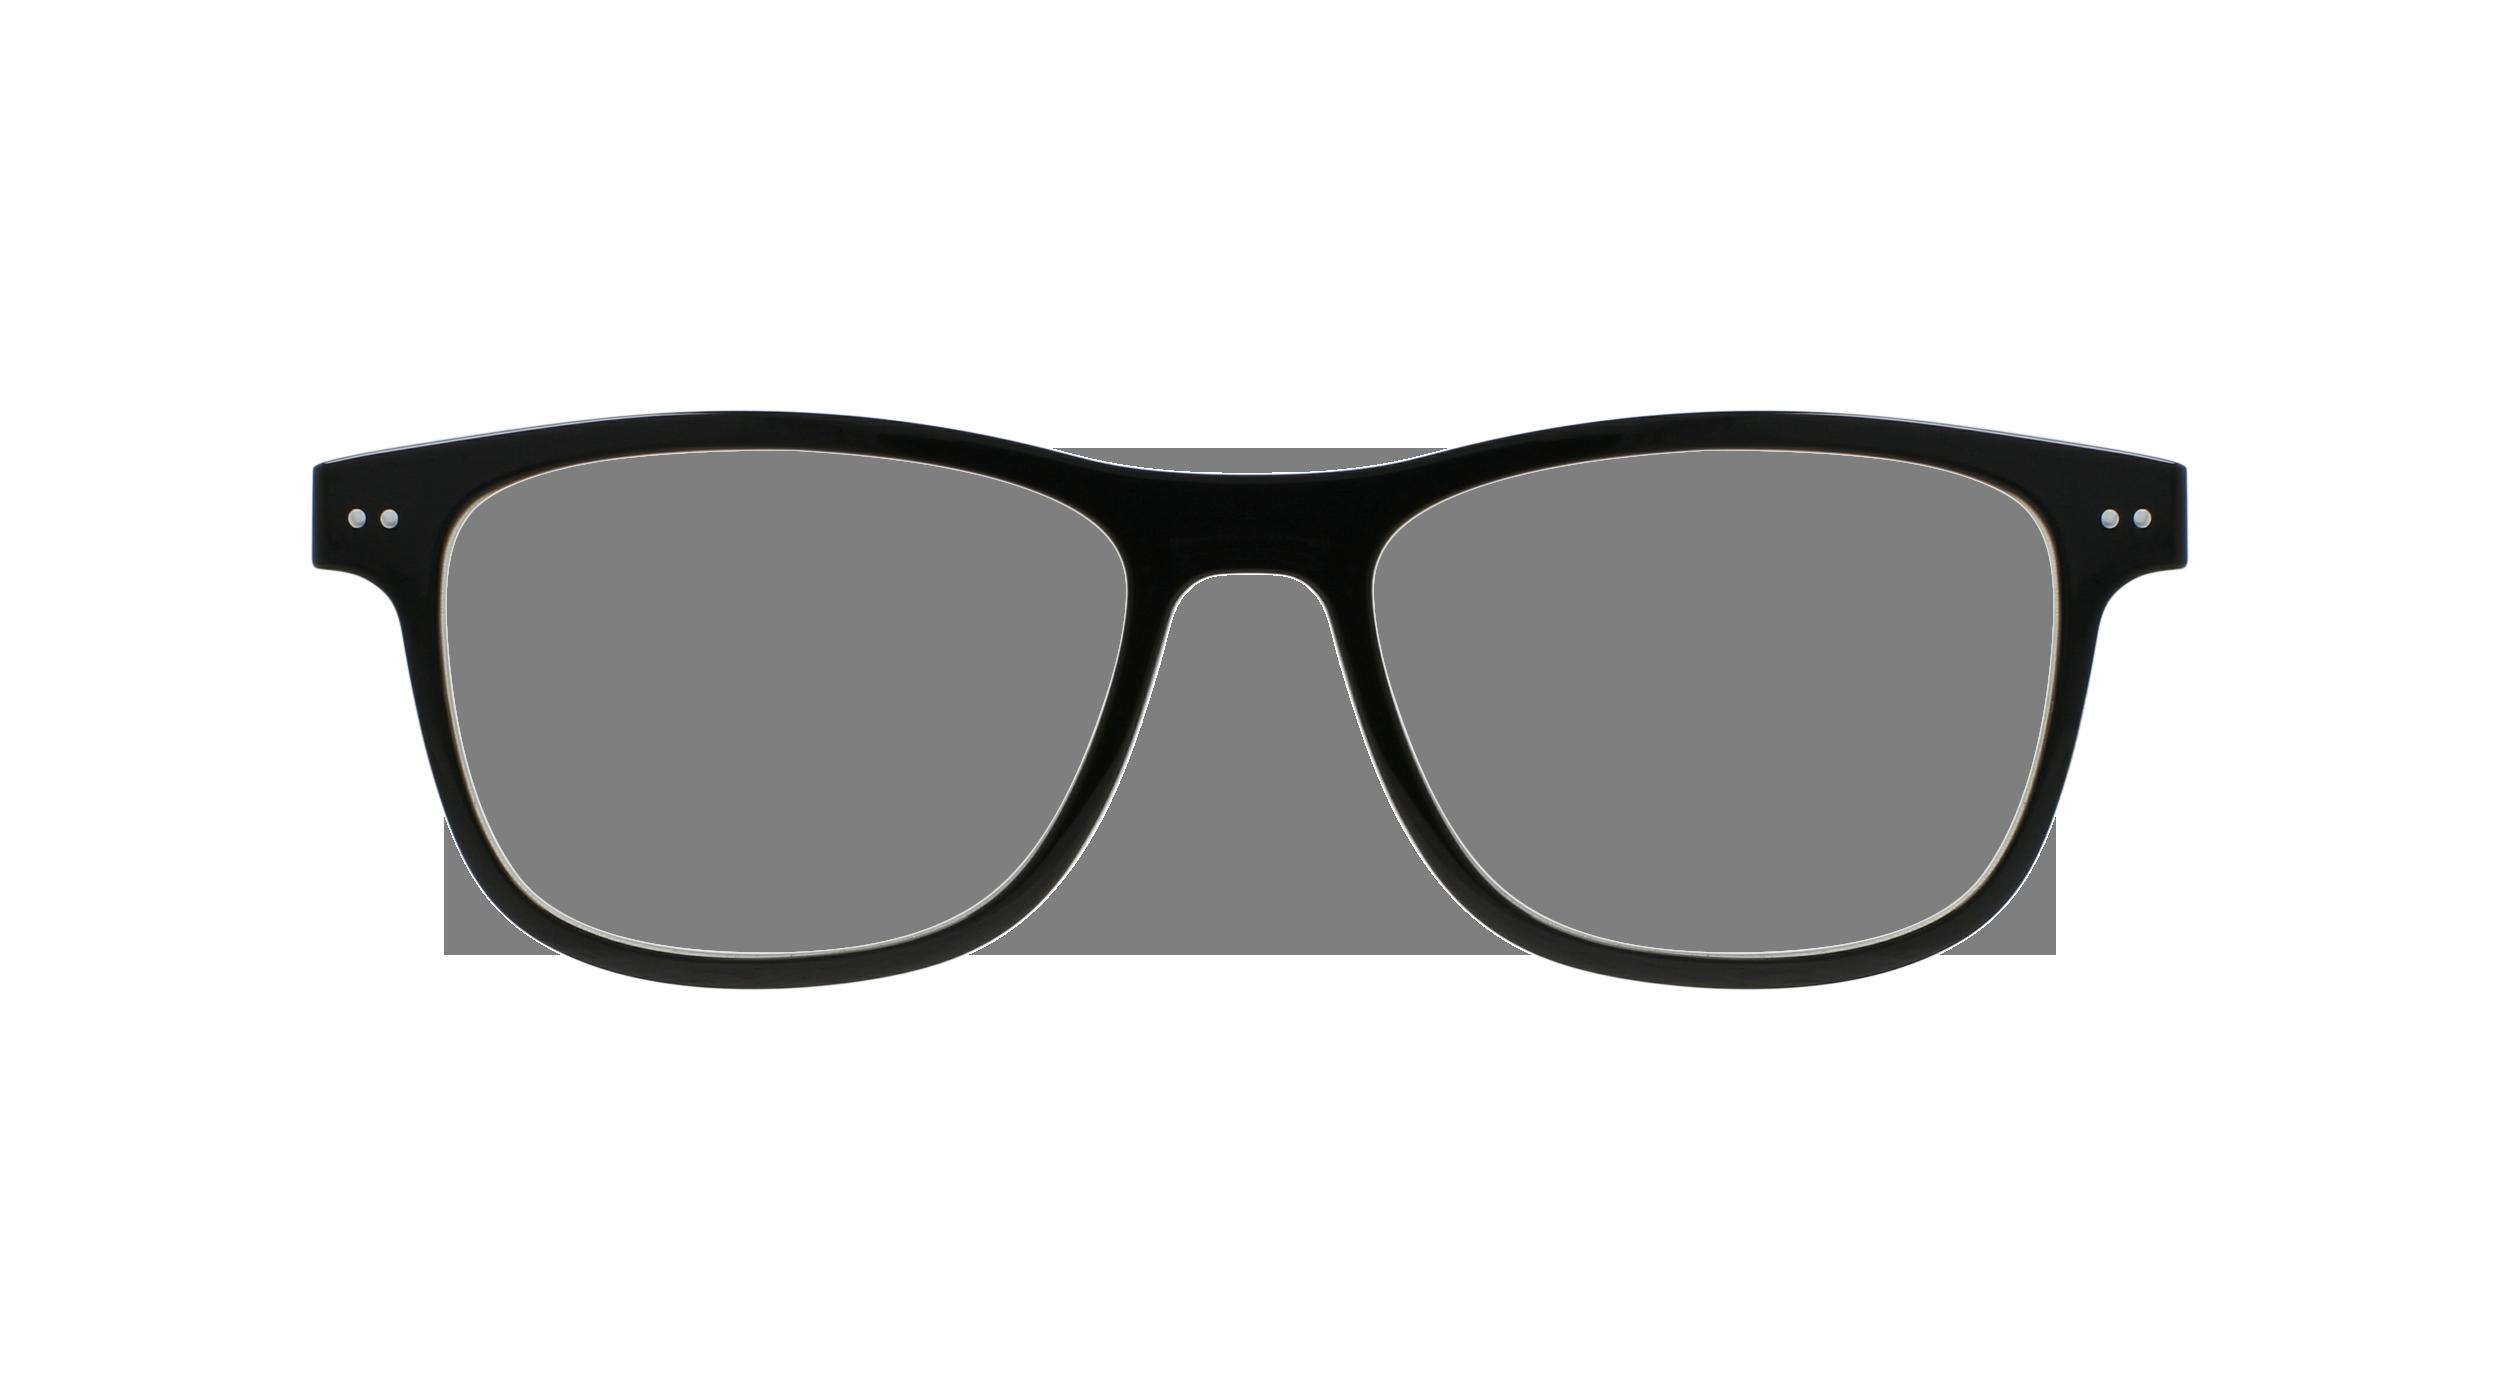 afflelou/france/products/smart_clip/clips_glasses/07630036452561.png